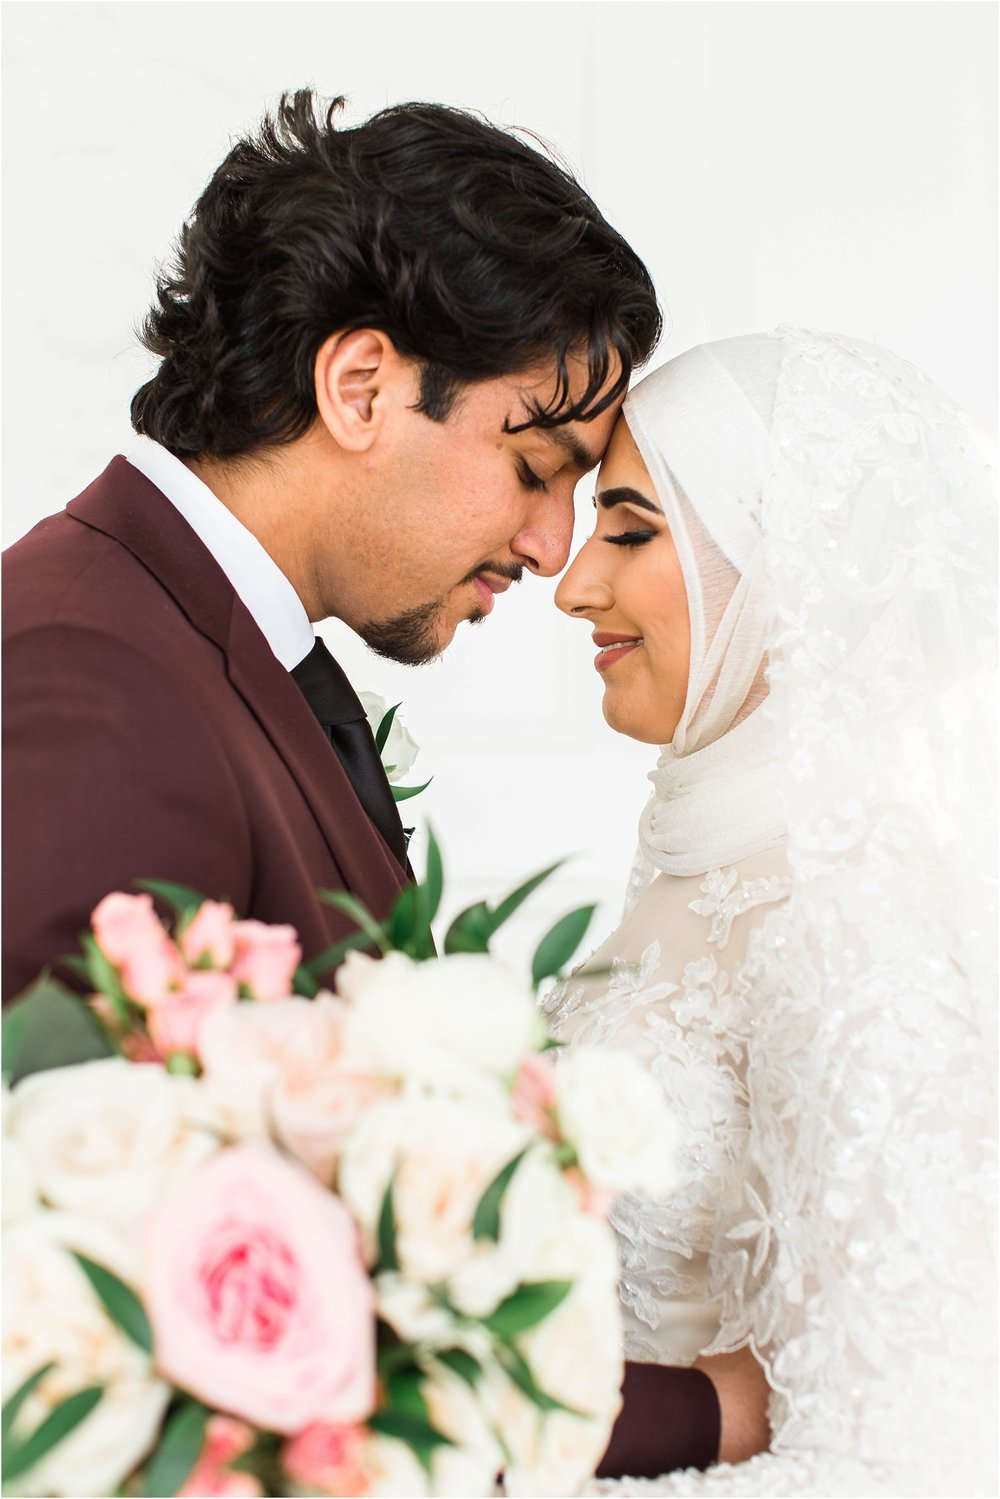 Red-Rose-Convention-Mint-Room-Wedding-Toronto-Mississauga-Brampton-Scarborough-GTA-Pakistani-Indian-Wedding-Engagement-Photographer-Photography_0116.jpg